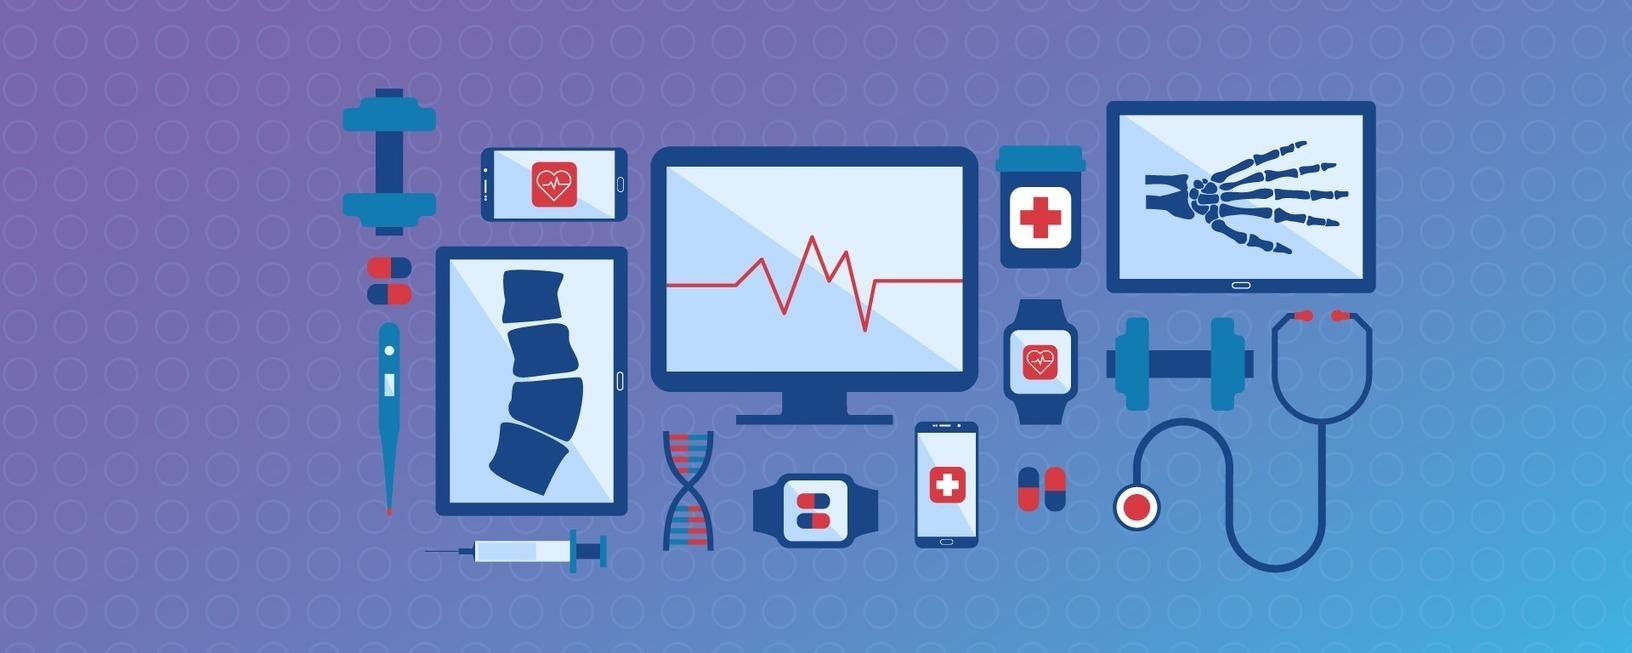 Digital Health Technology is Taking Off Off in Clinical Trials | E-HEALTH - E-SANTE - PHARMAGEEK